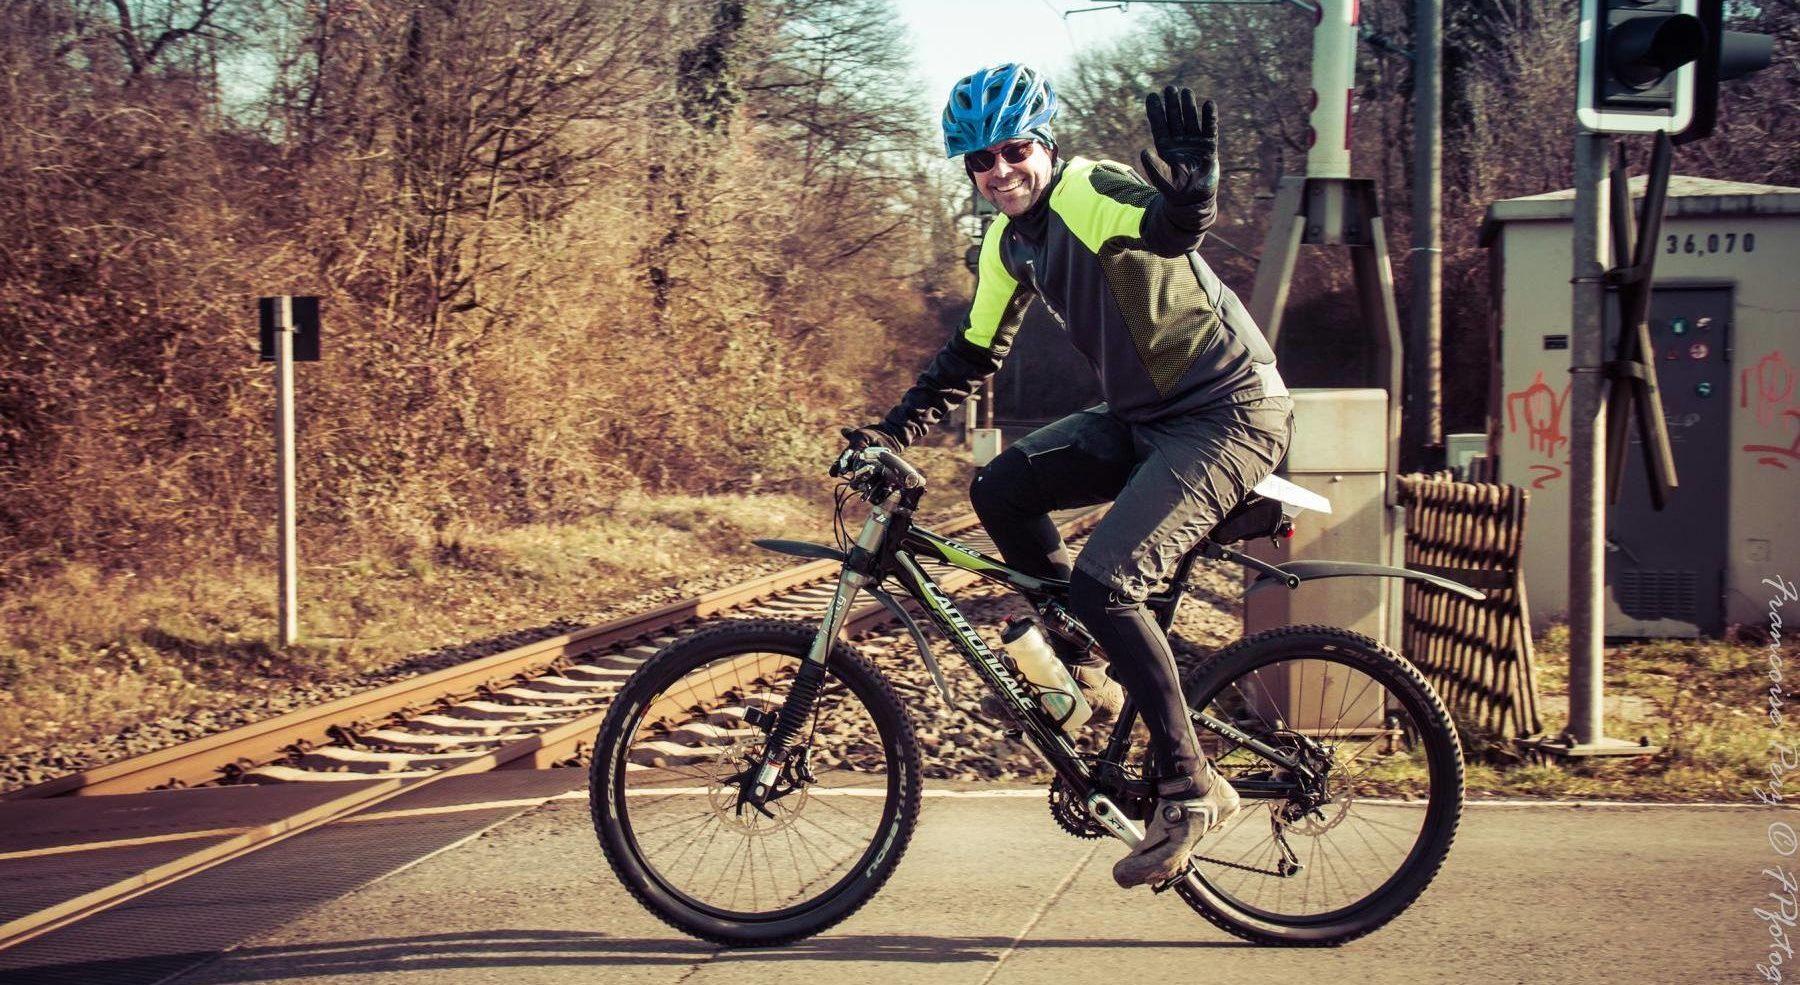 Mountainbike, Foto: Francoise Perz FPfotography (2019)